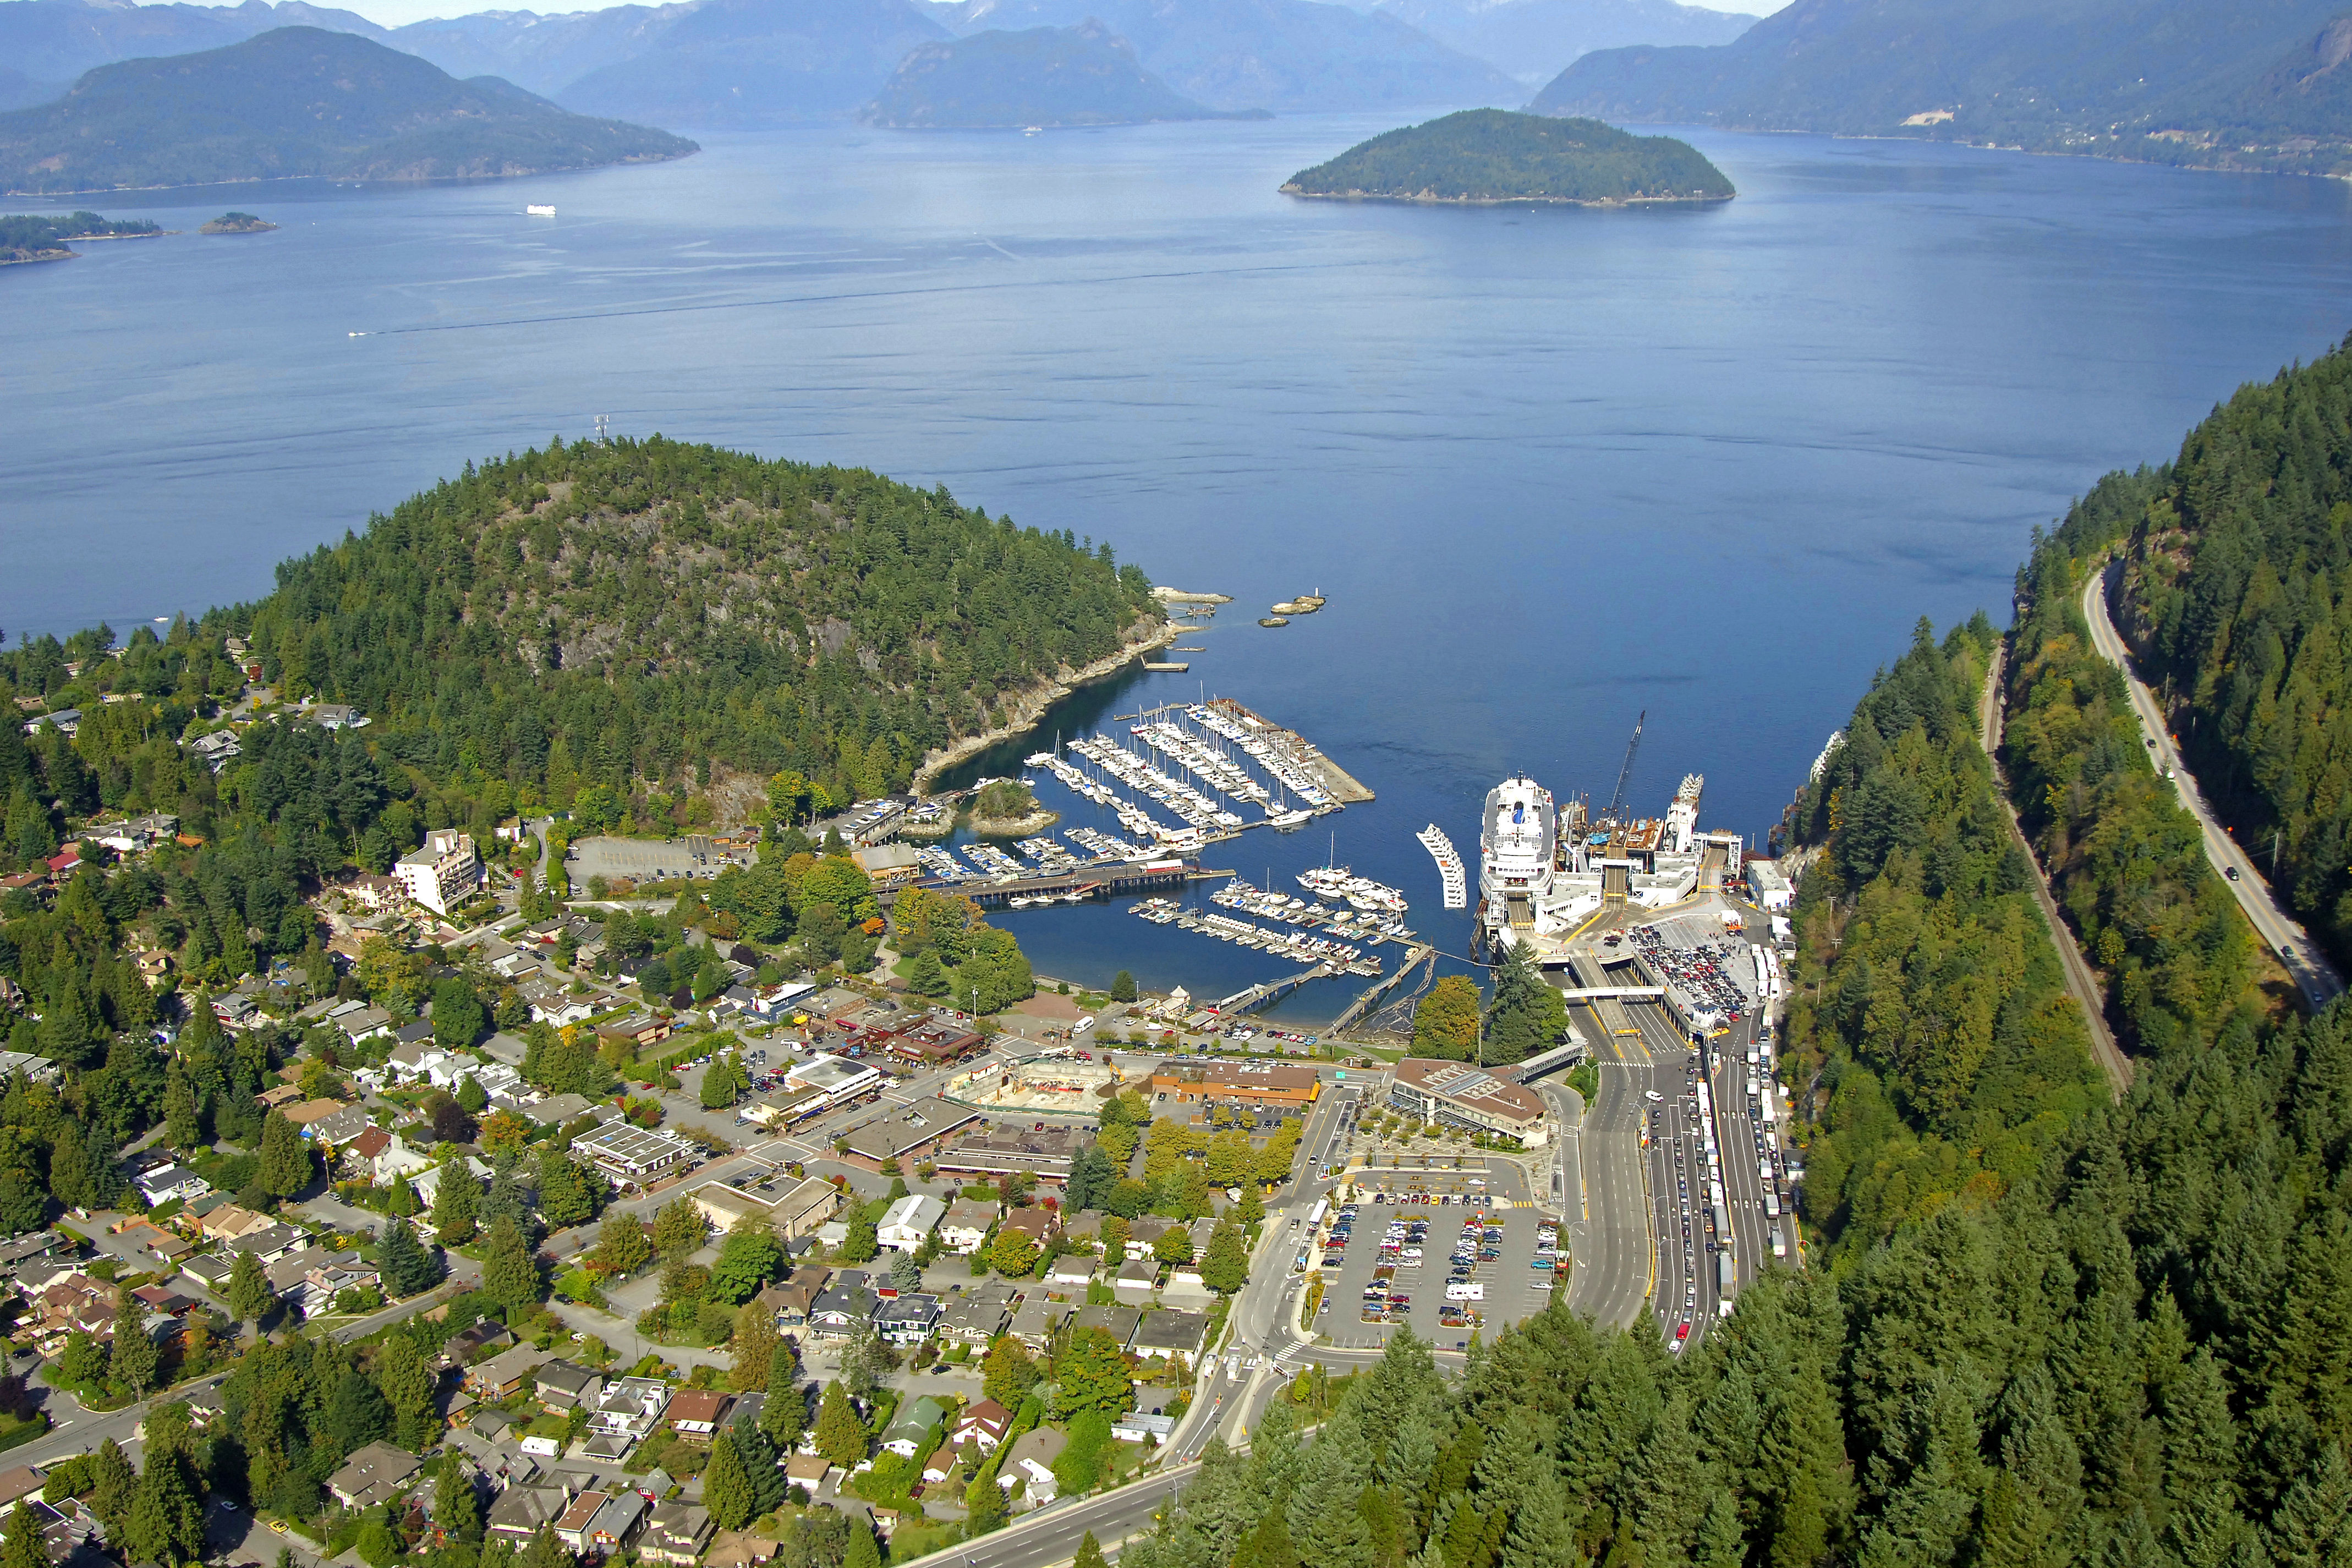 horseshoe bay in bc  canada - harbor reviews